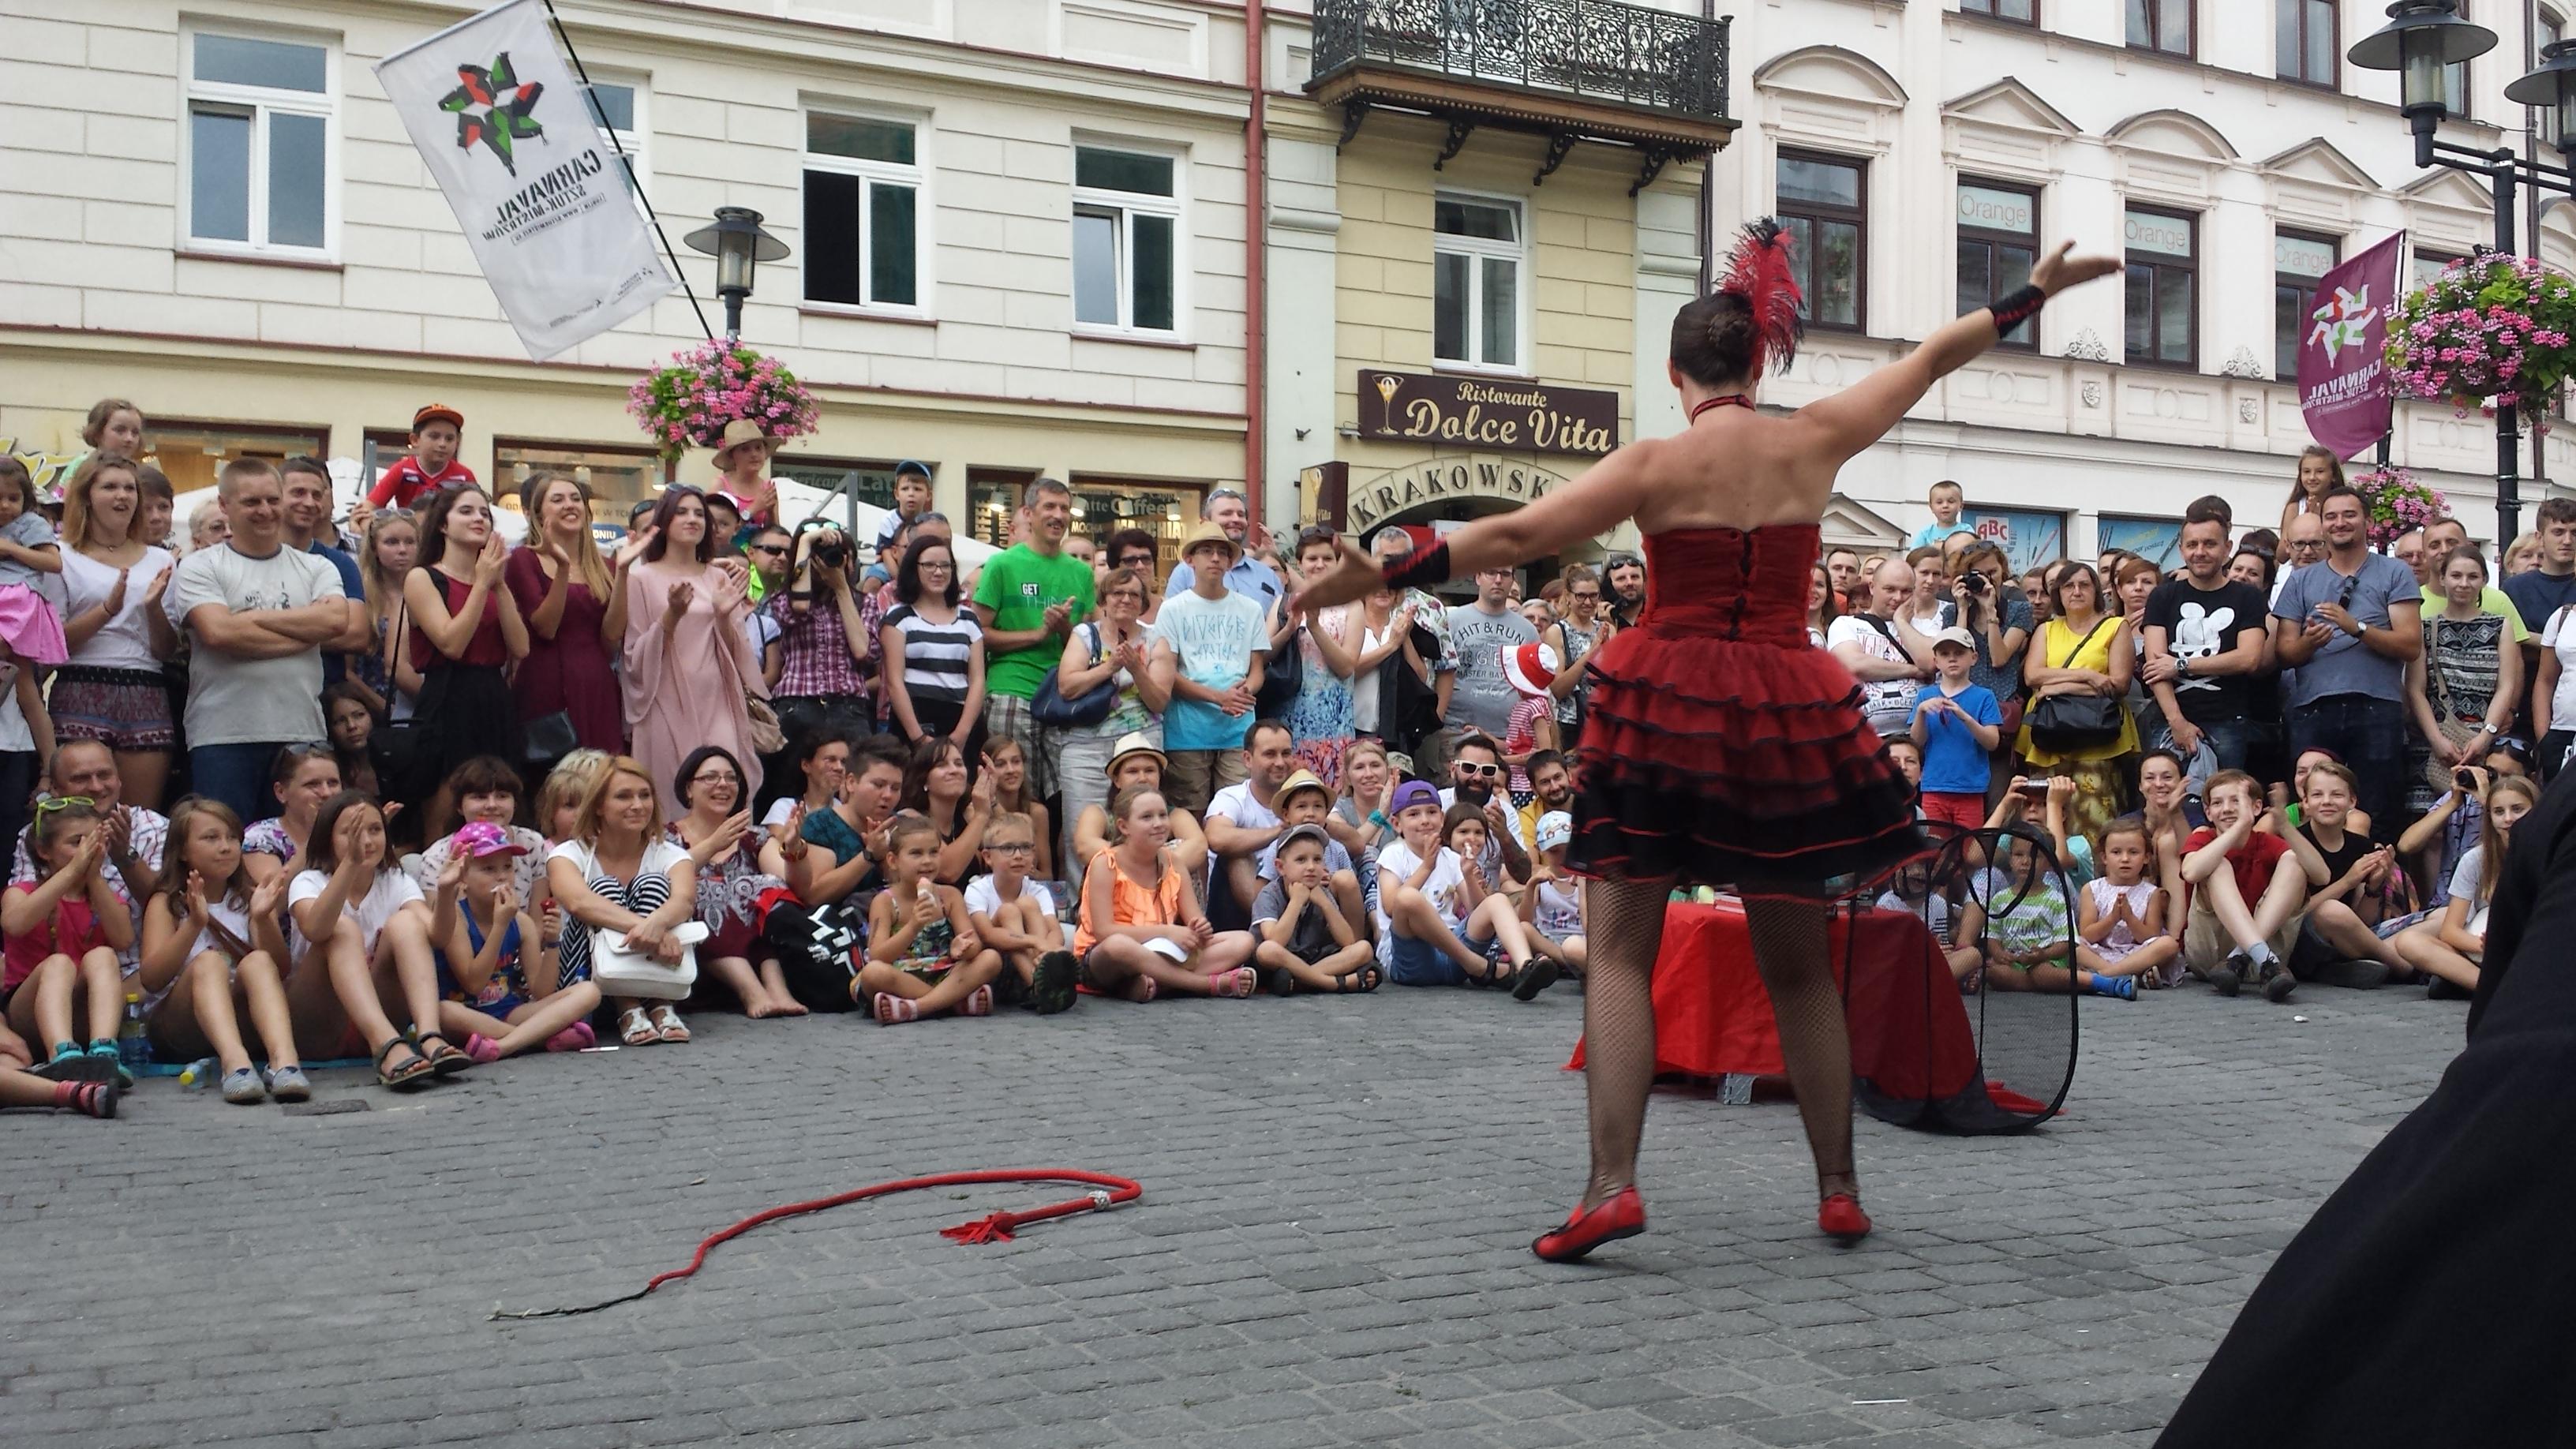 Dublin in Poland